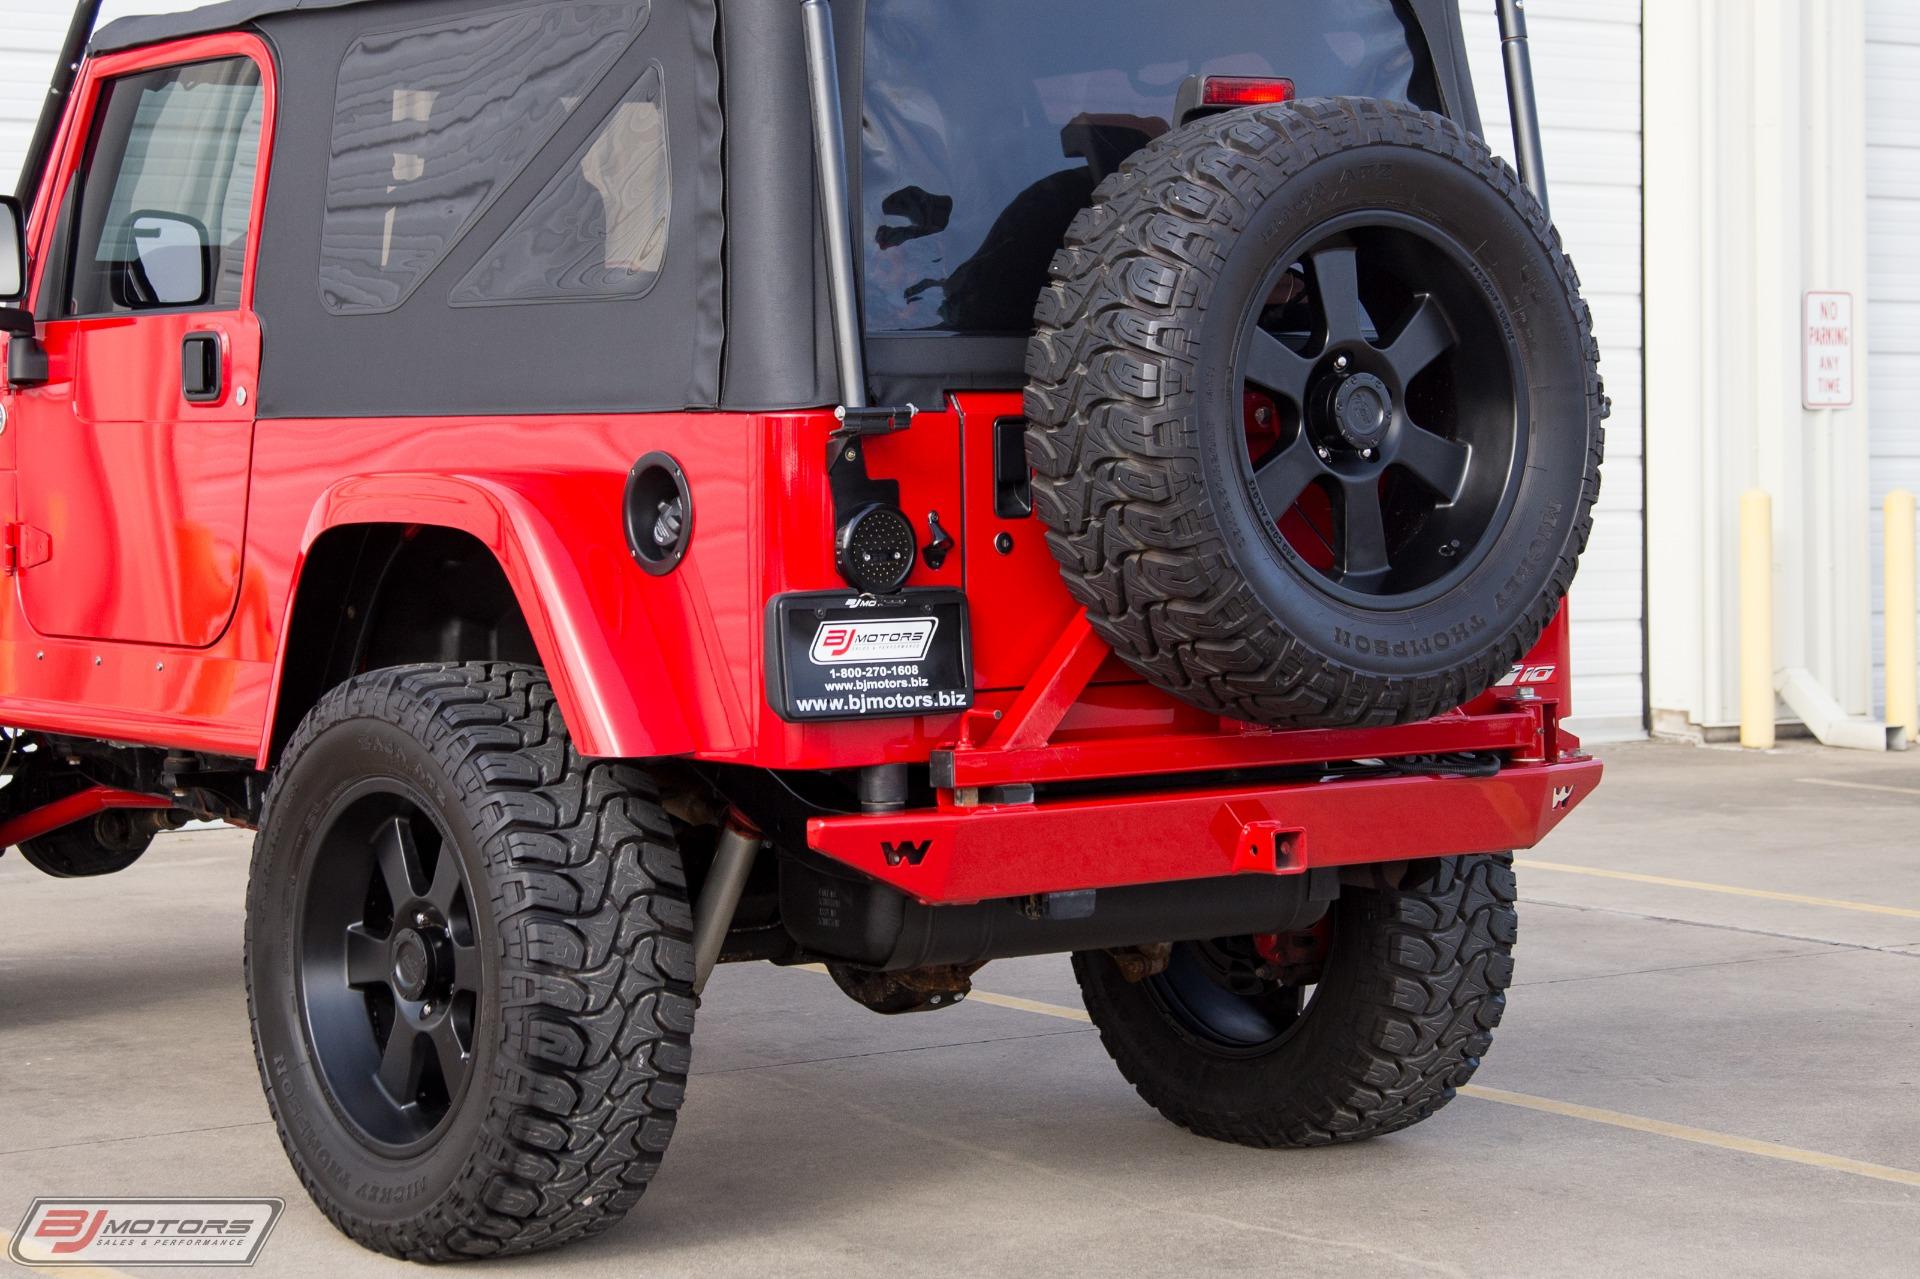 Used-2005-Jeep-Wrangler-LJ-Unlimited-Viper